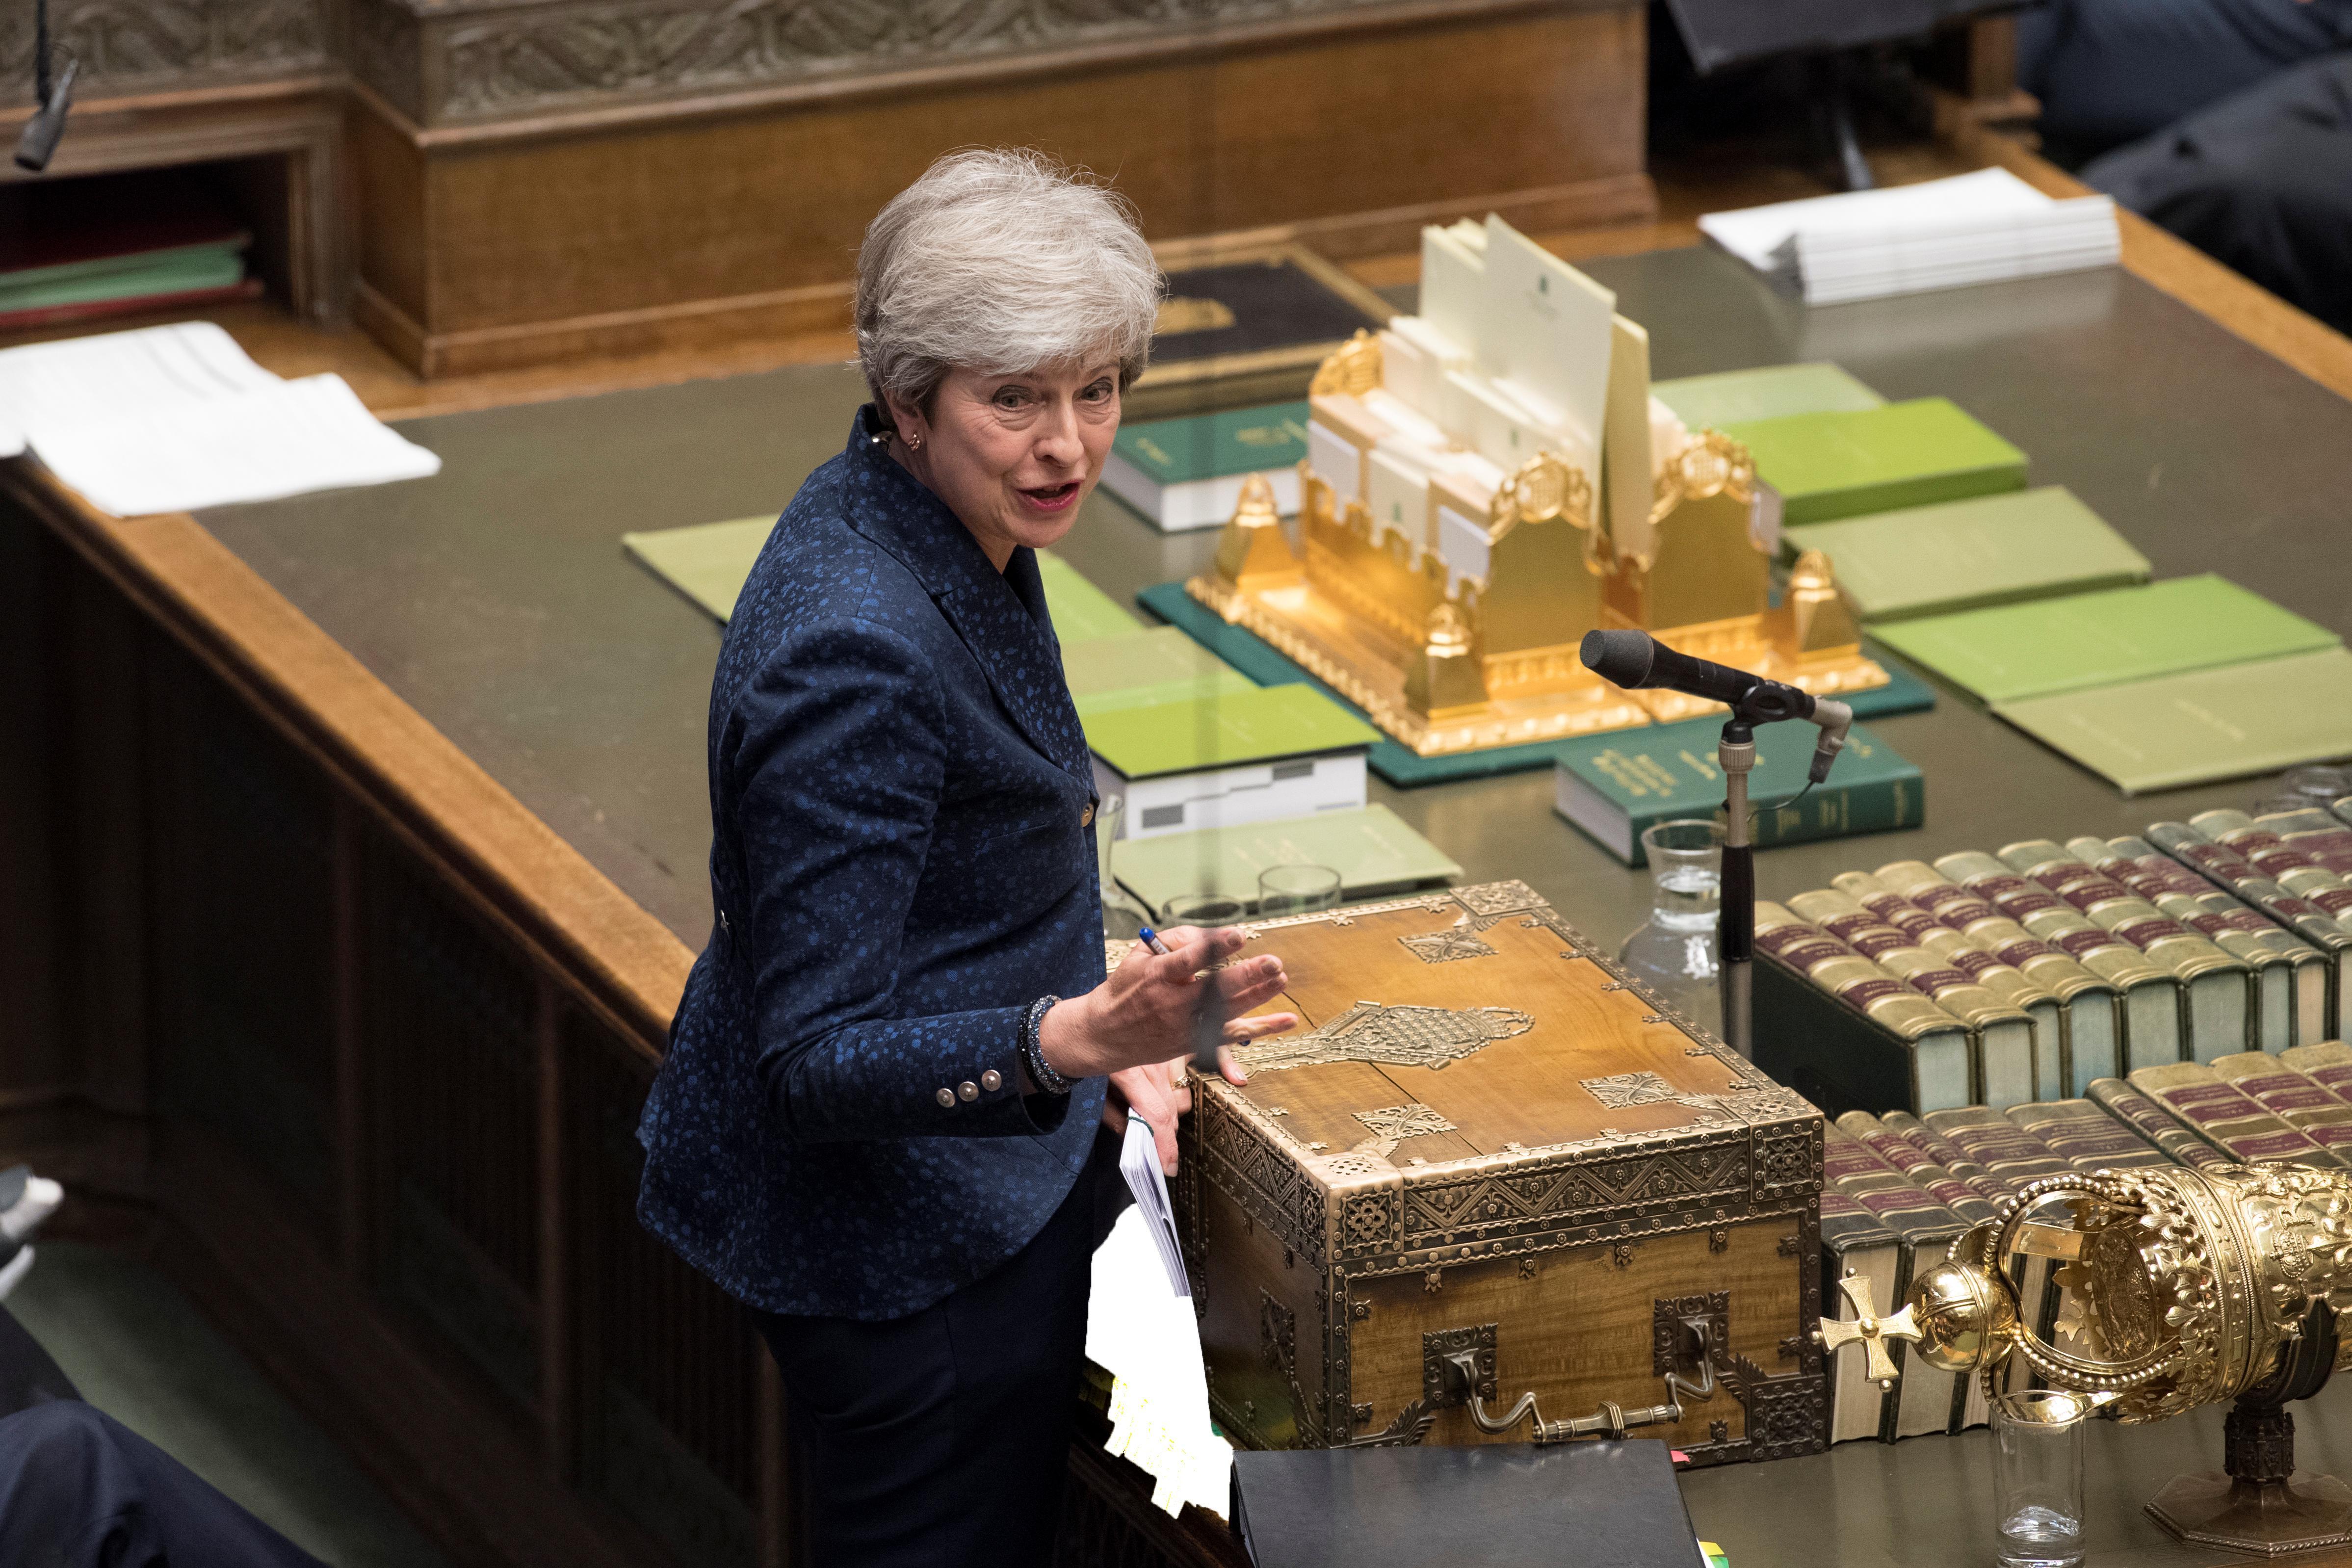 May seeks £27 billion boost for education - Sunday Telegraph